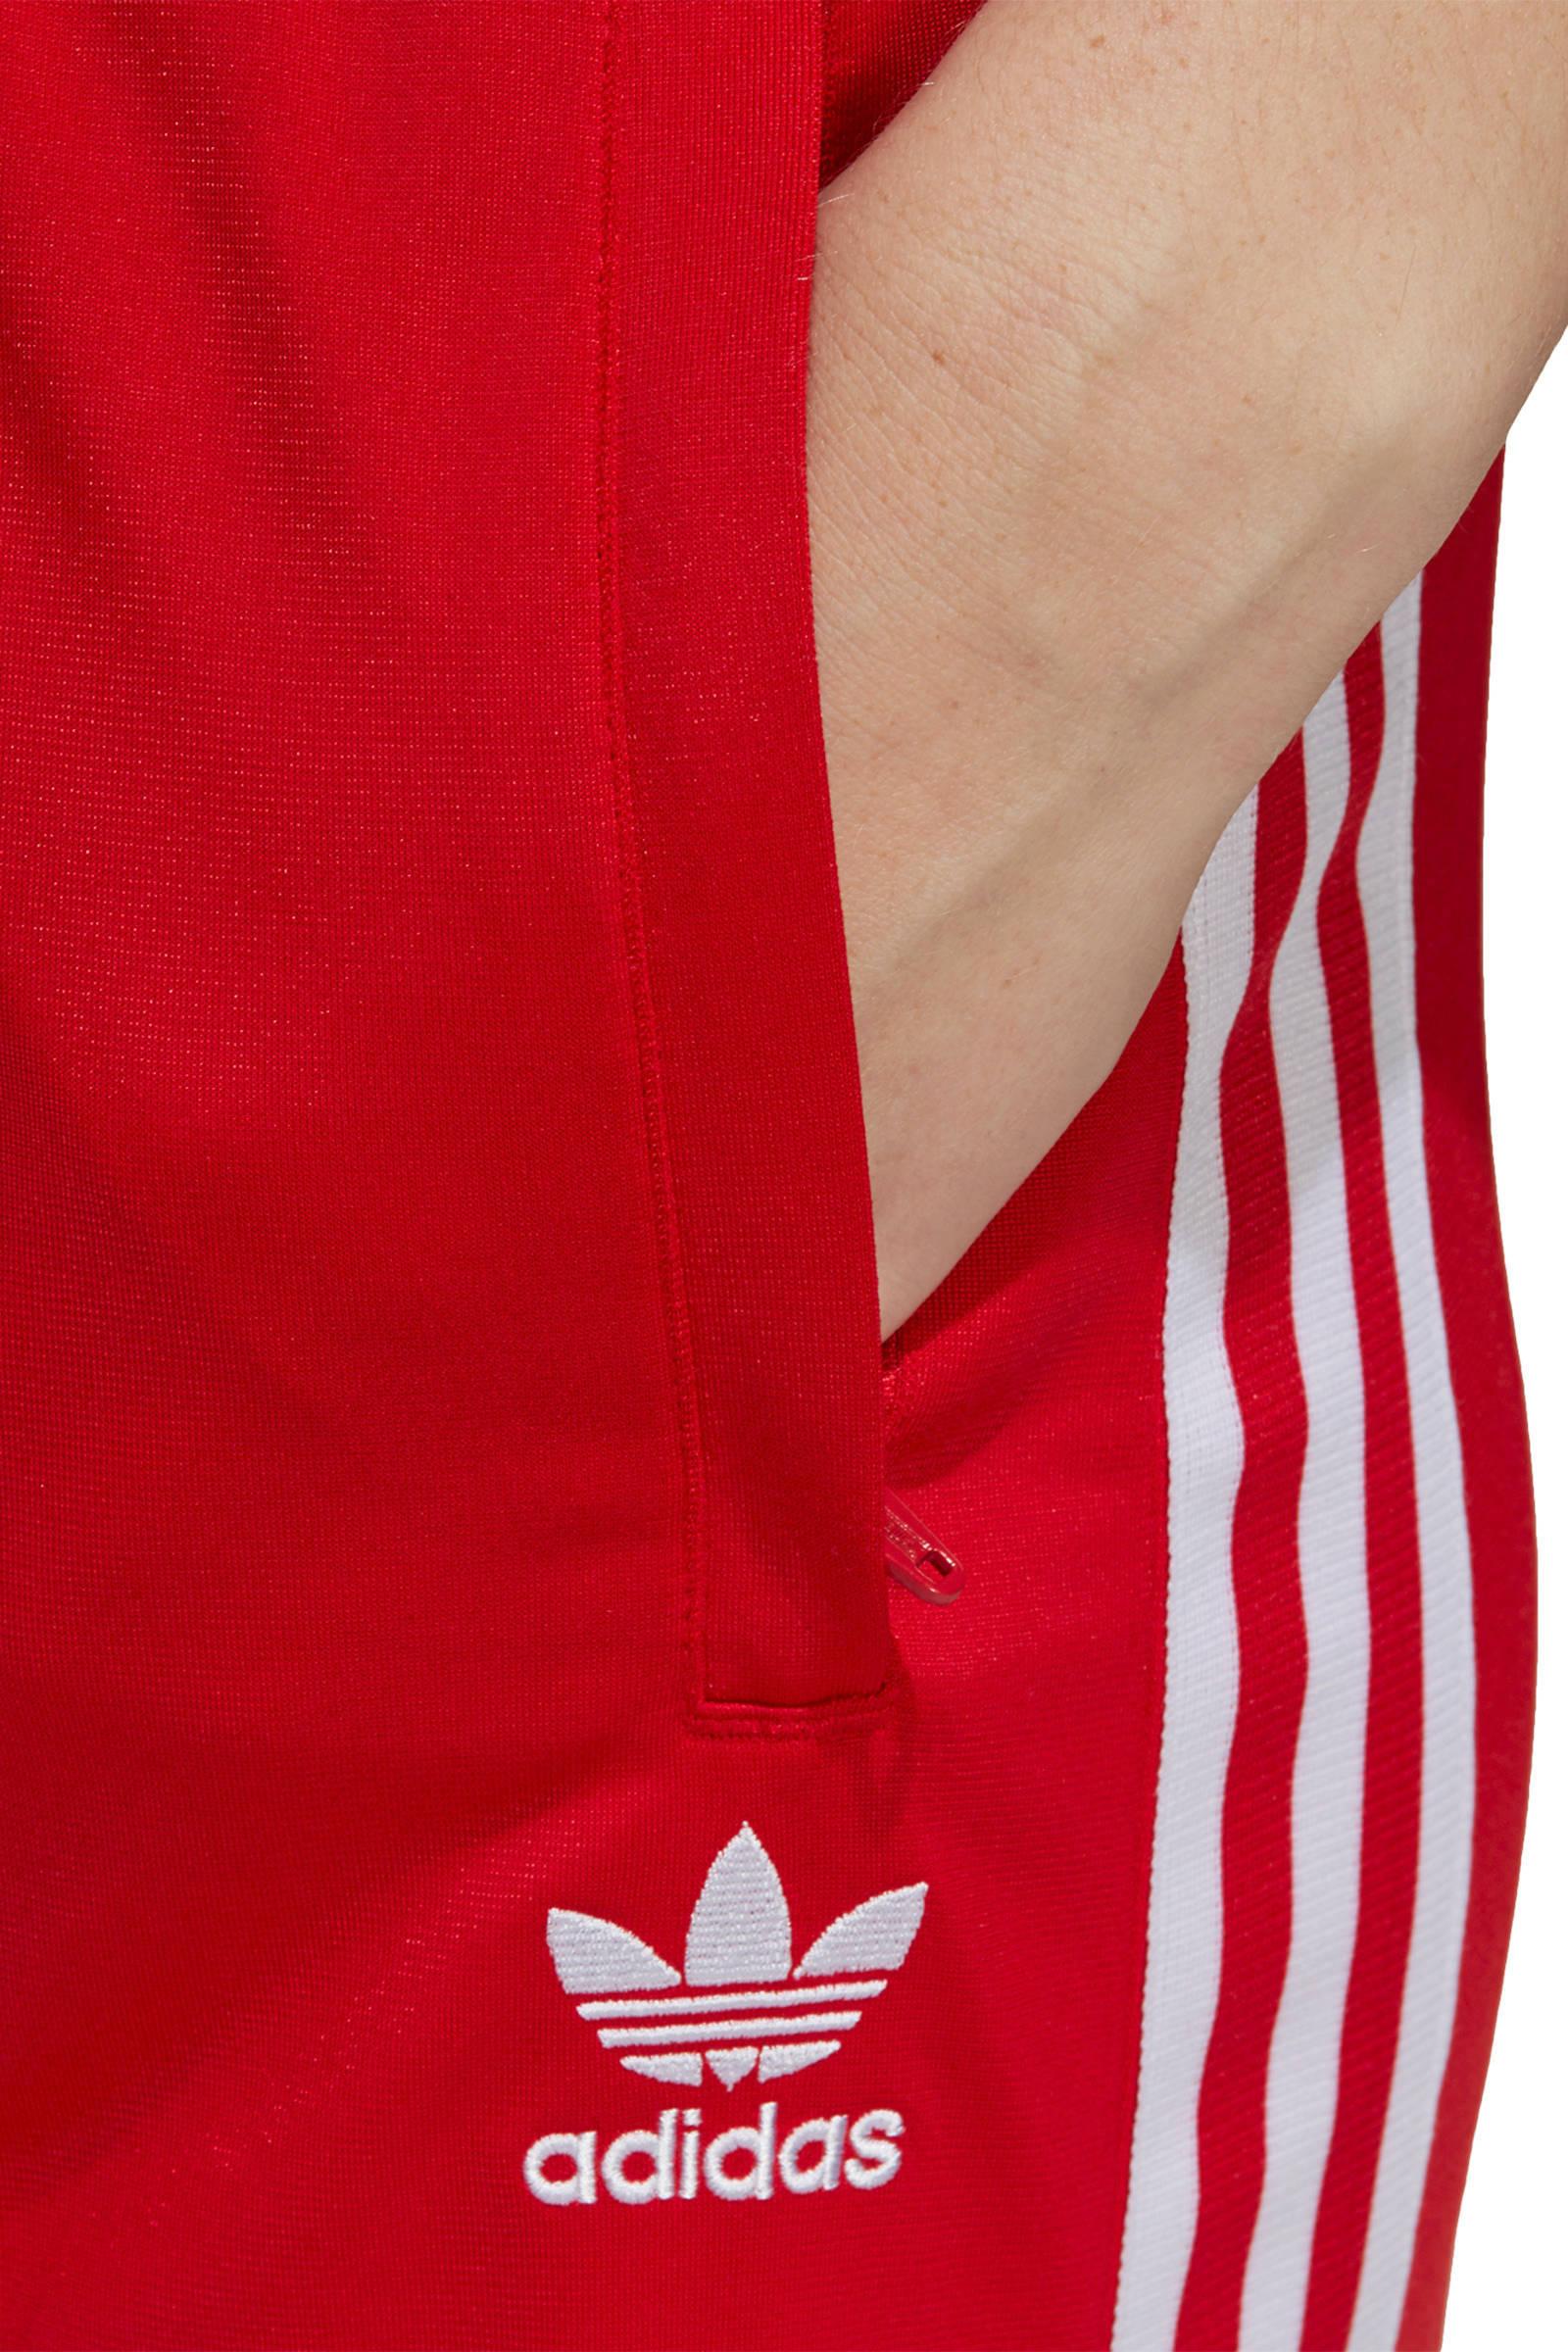 adidas Originals adidas Originals Valentine's Day trainingsbroek roodwit